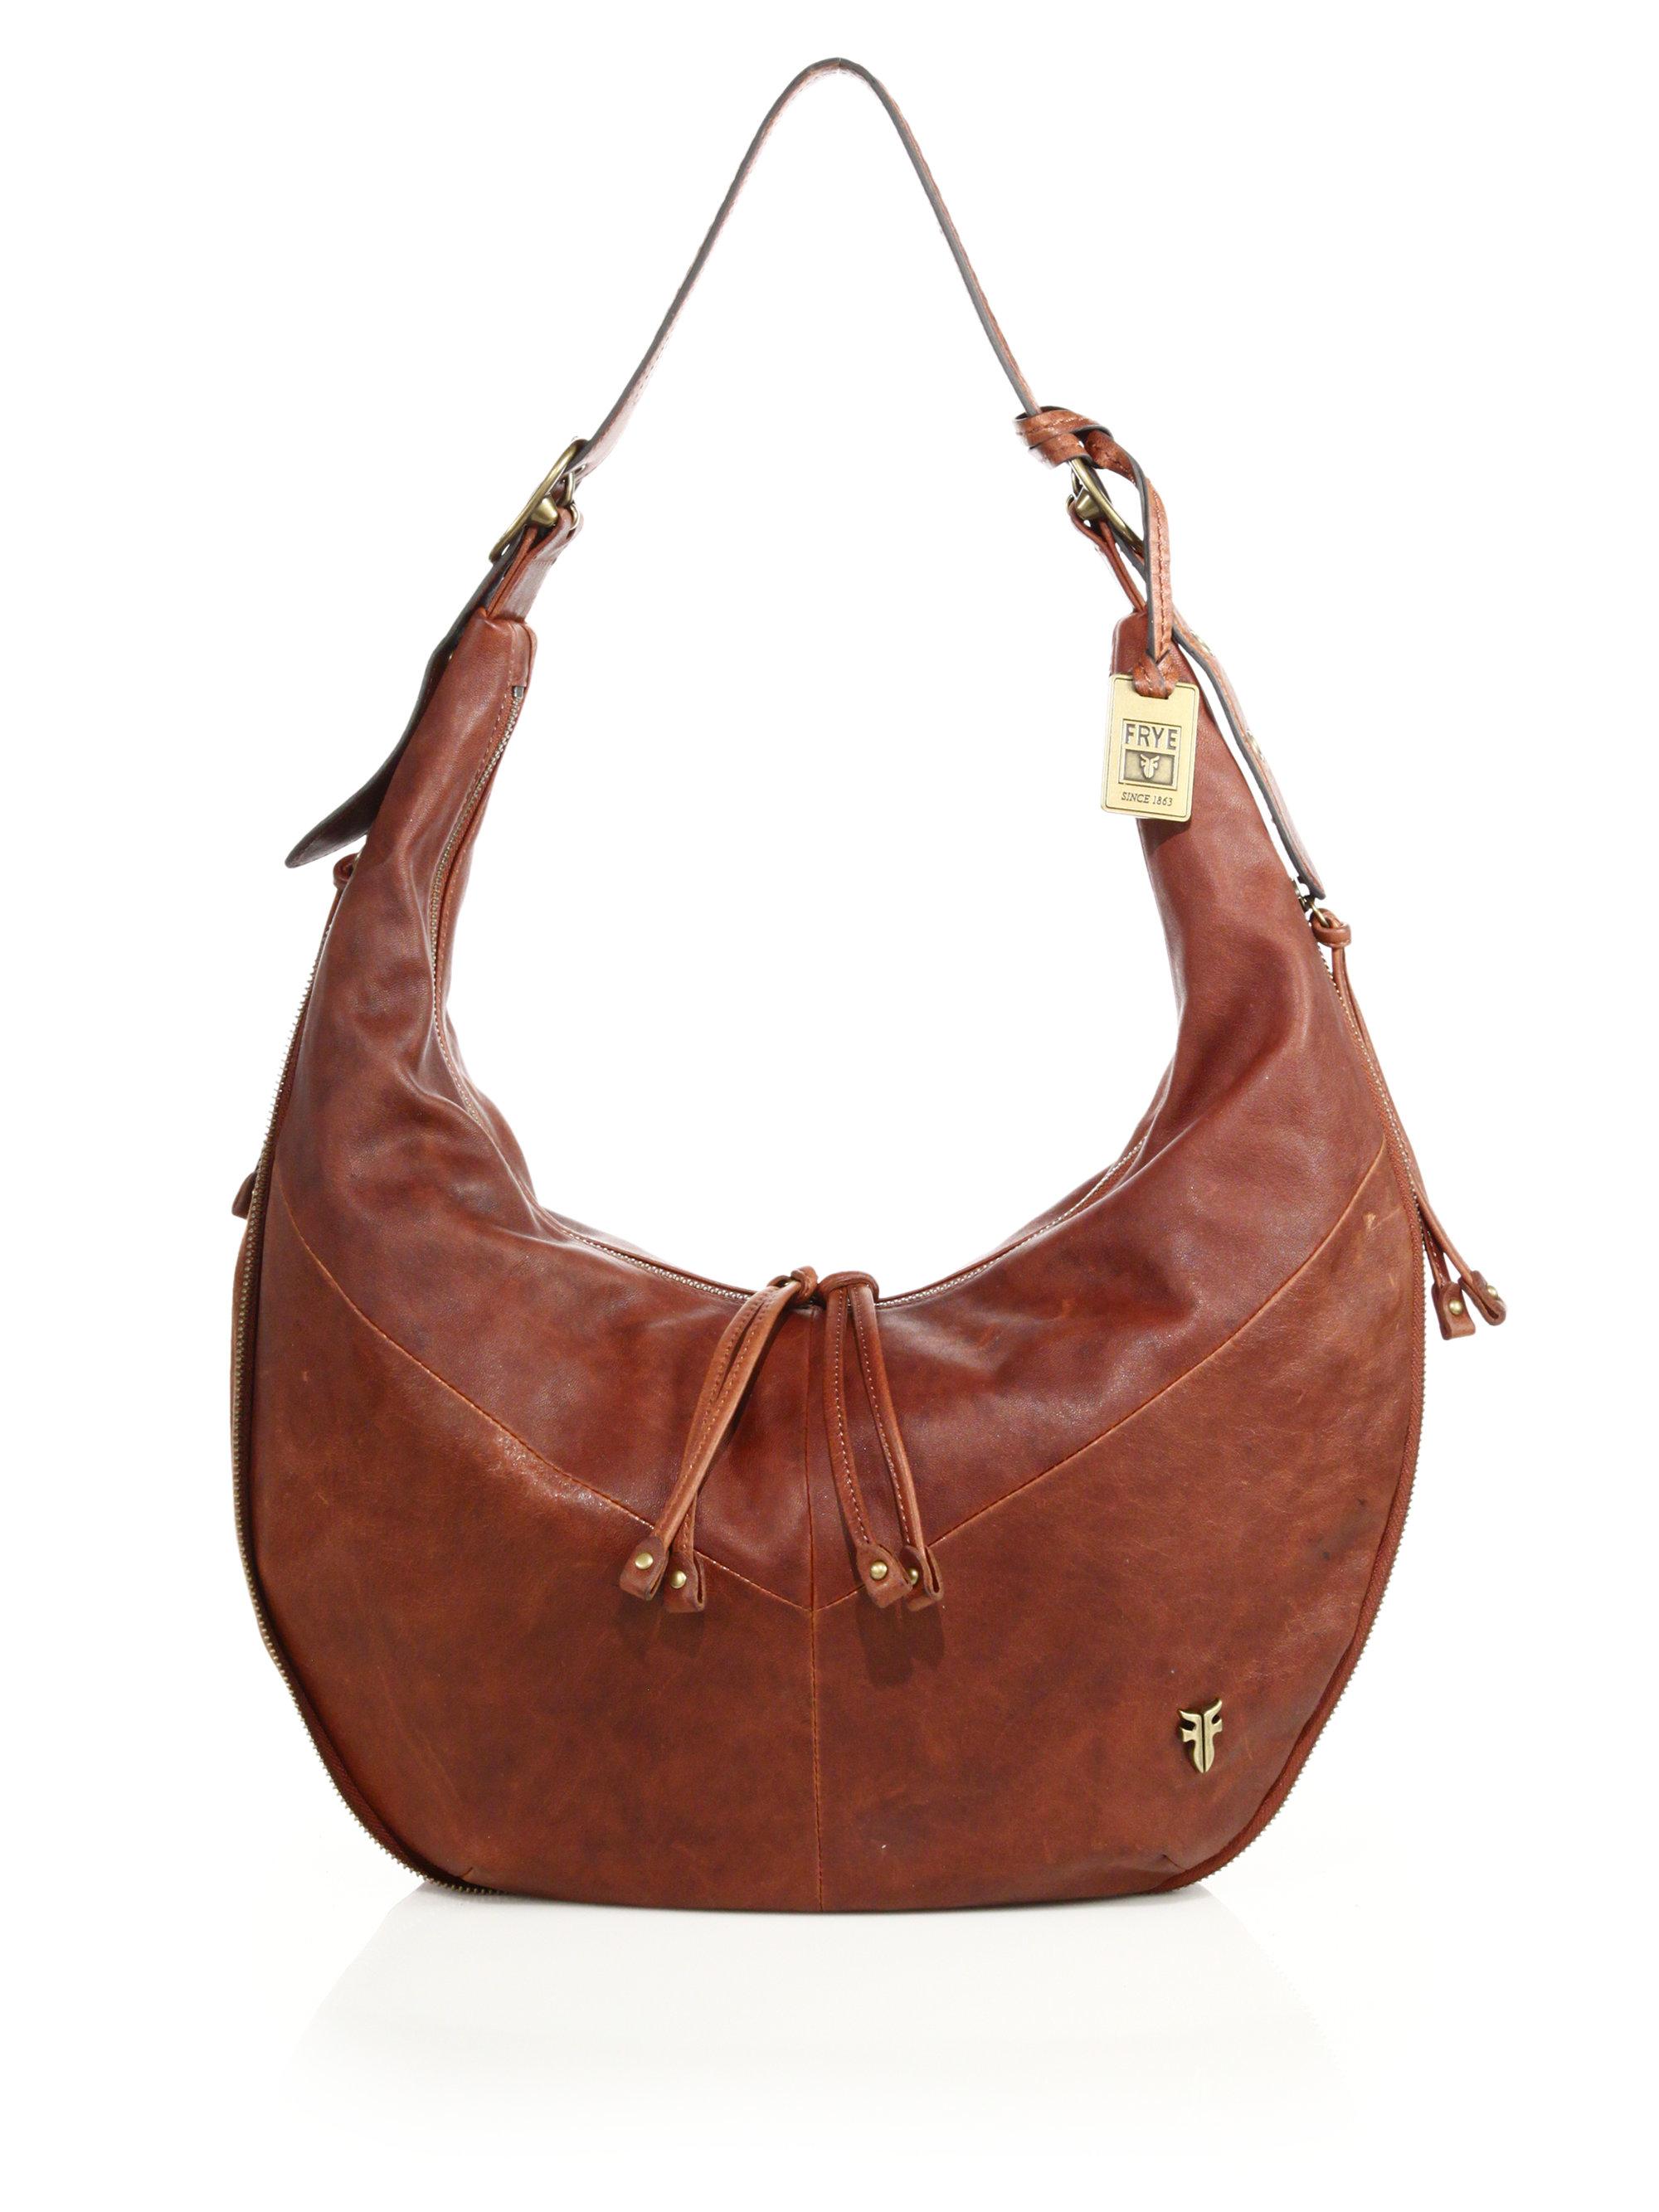 7c69fd49f2 Lyst - Frye Belle Bohemian Leather Hobo Bag in Brown